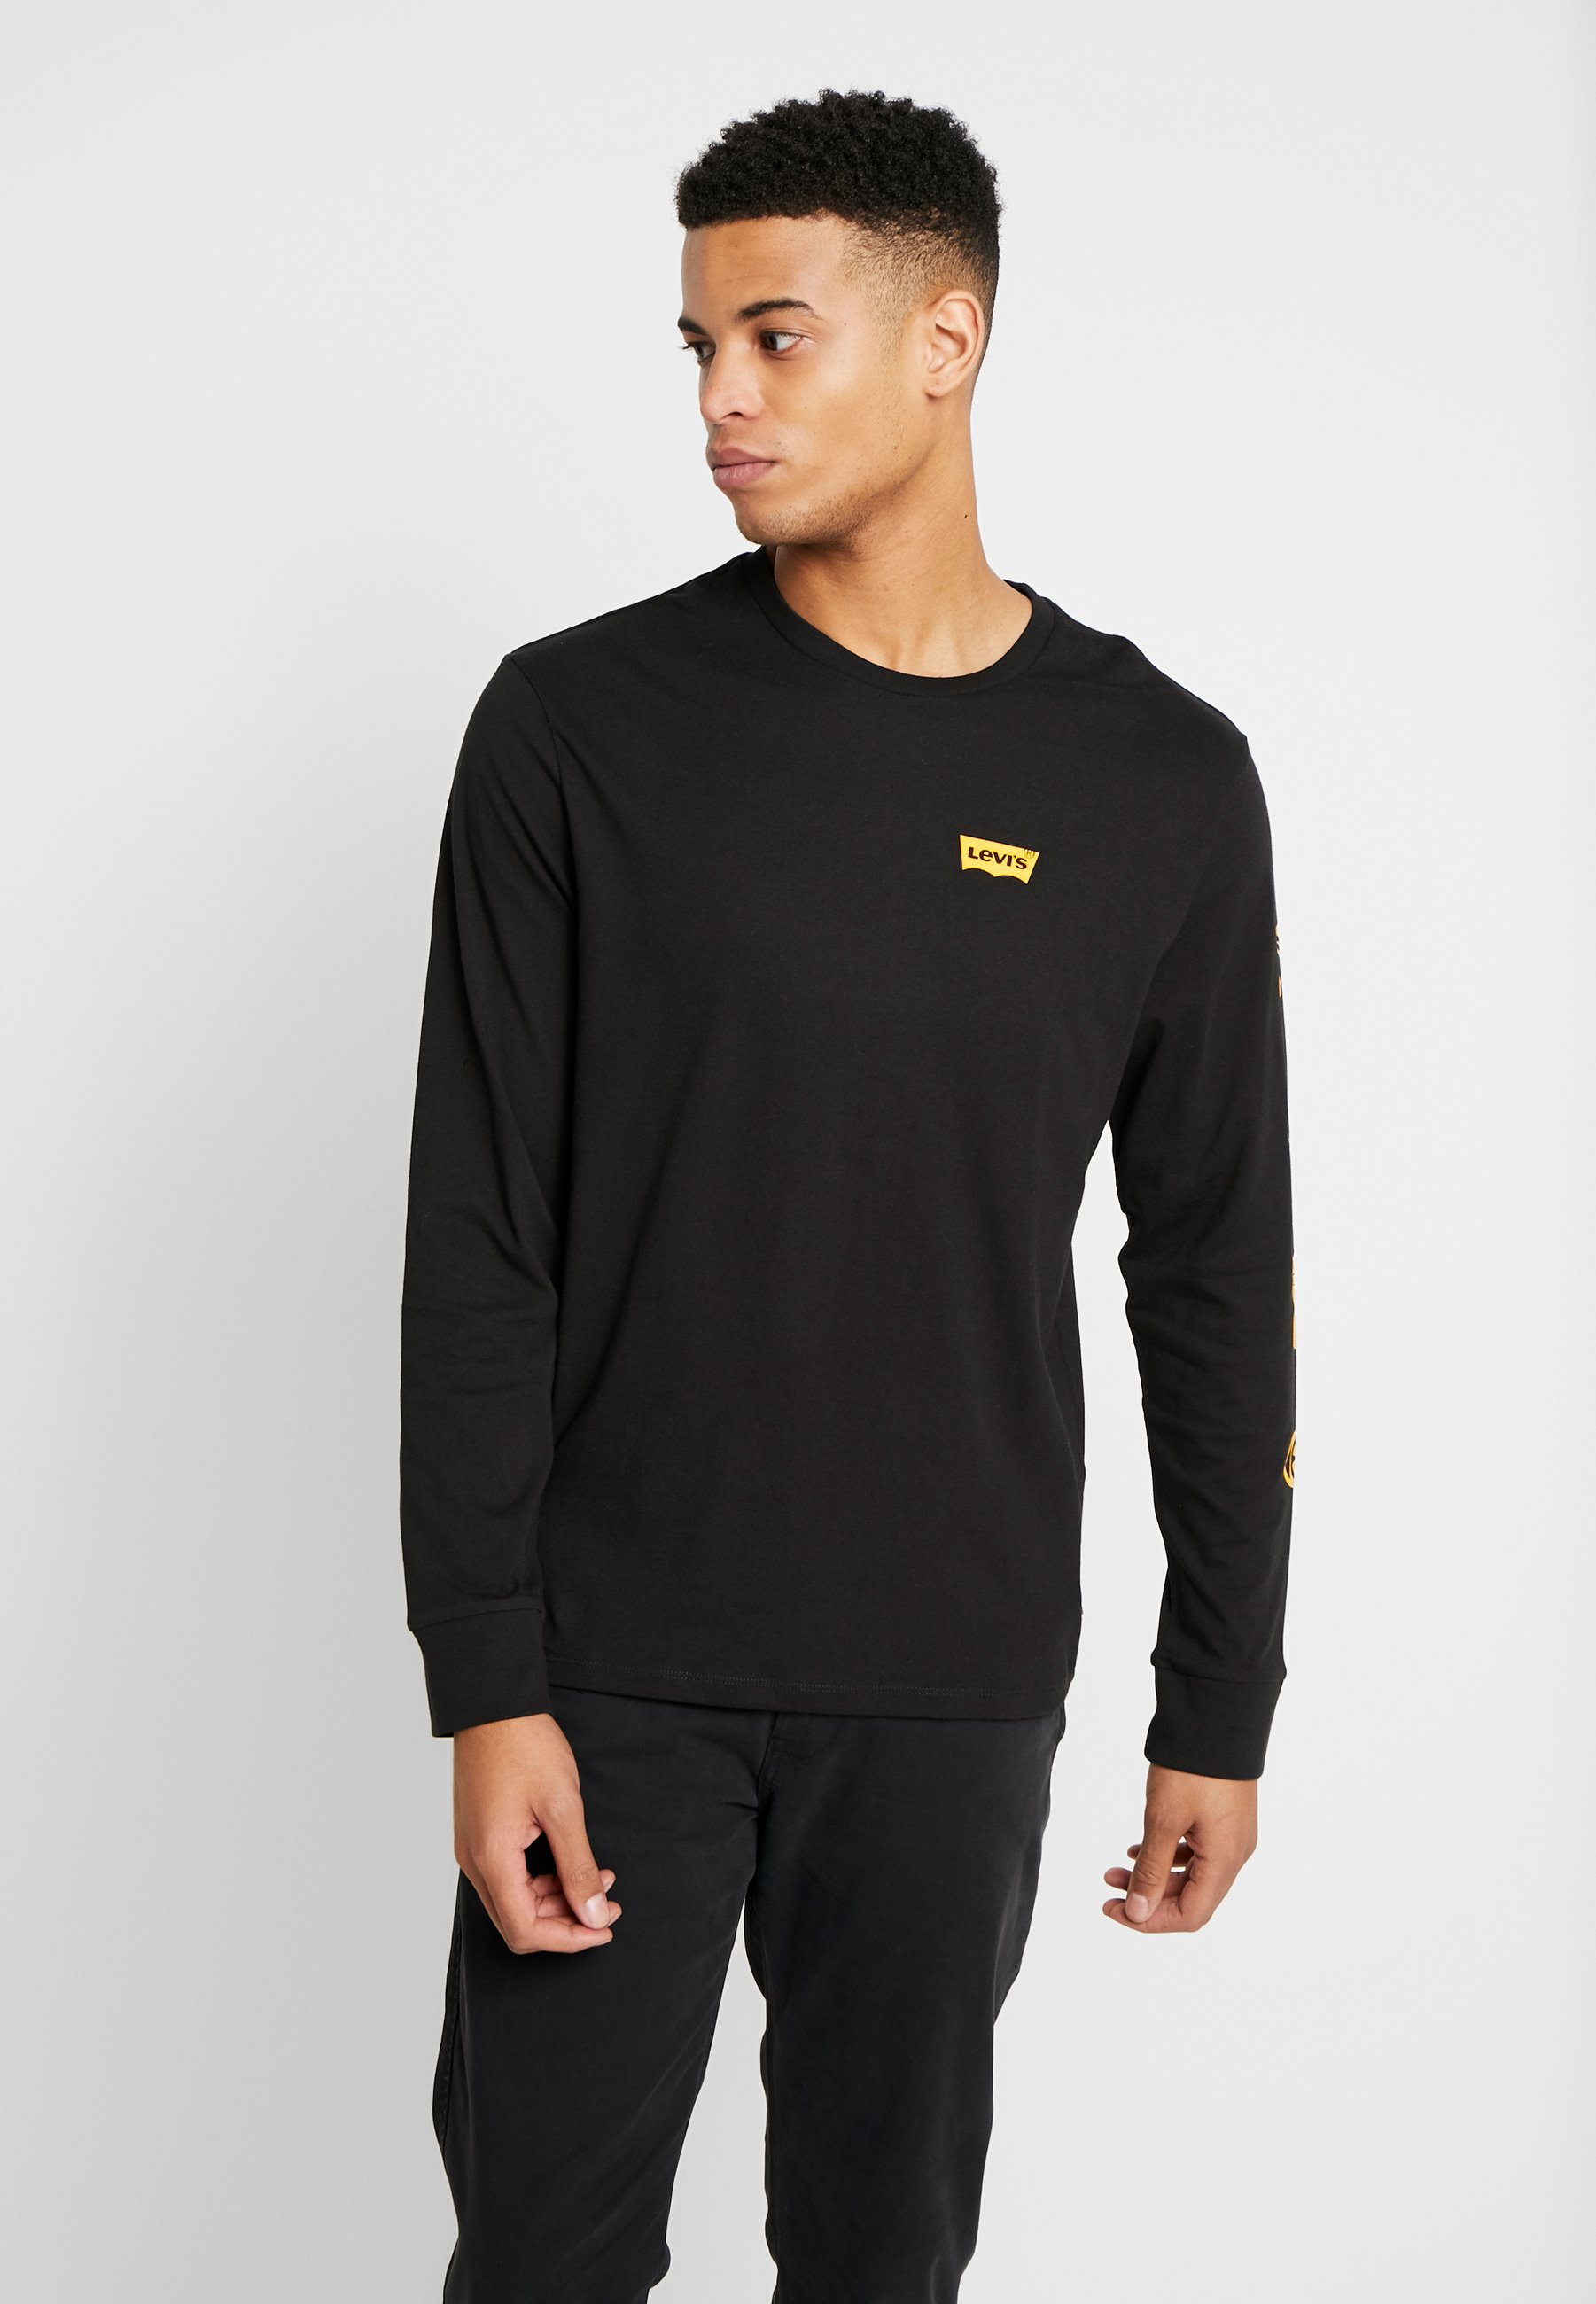 Levi's® Graphic Tee - T-shirt À Manches Longues World Mineral Black